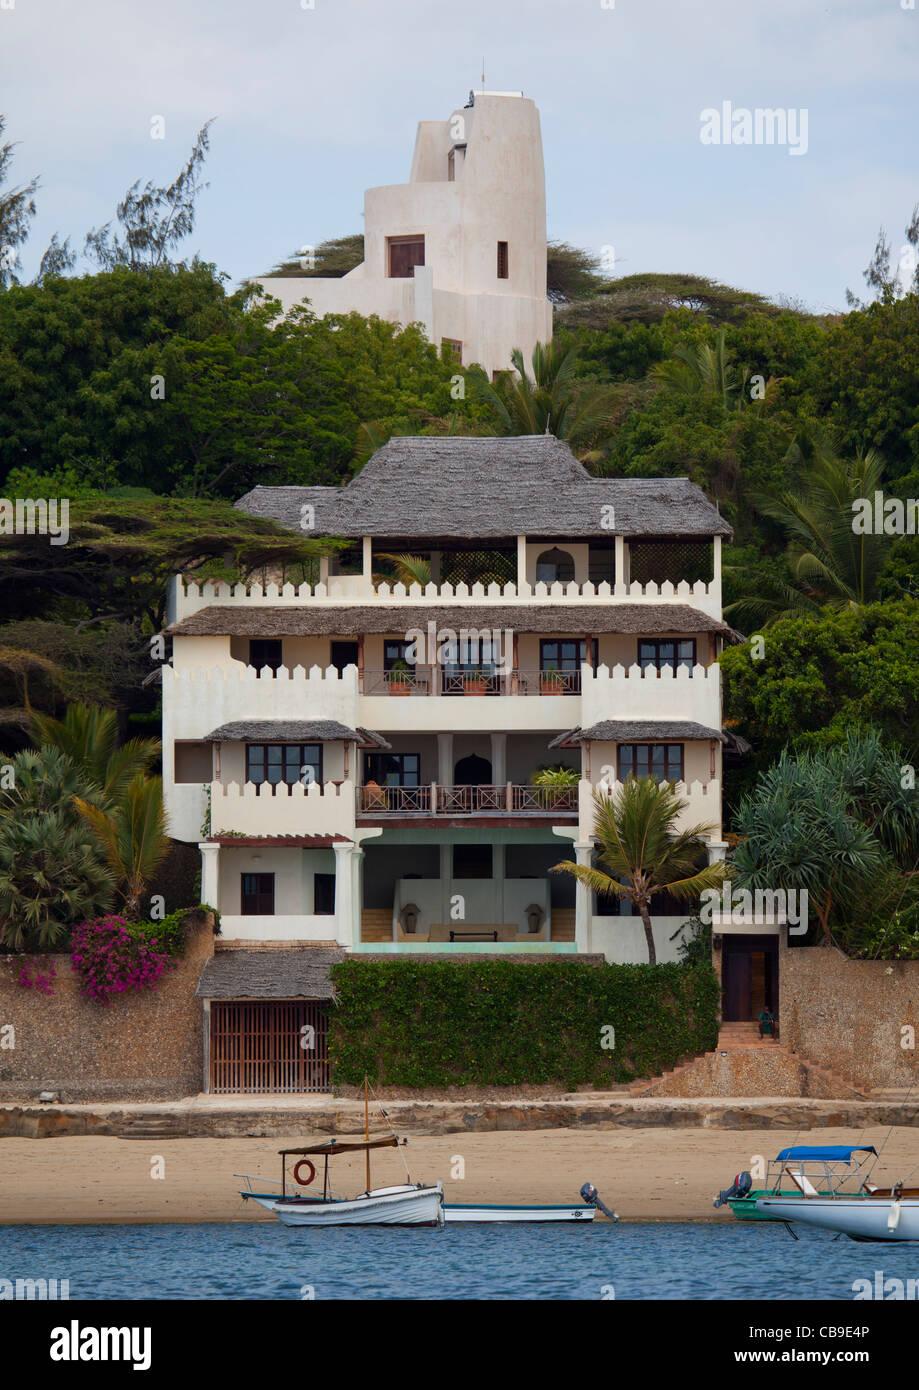 Hanover terrace stock photos hanover terrace stock for The hanover house